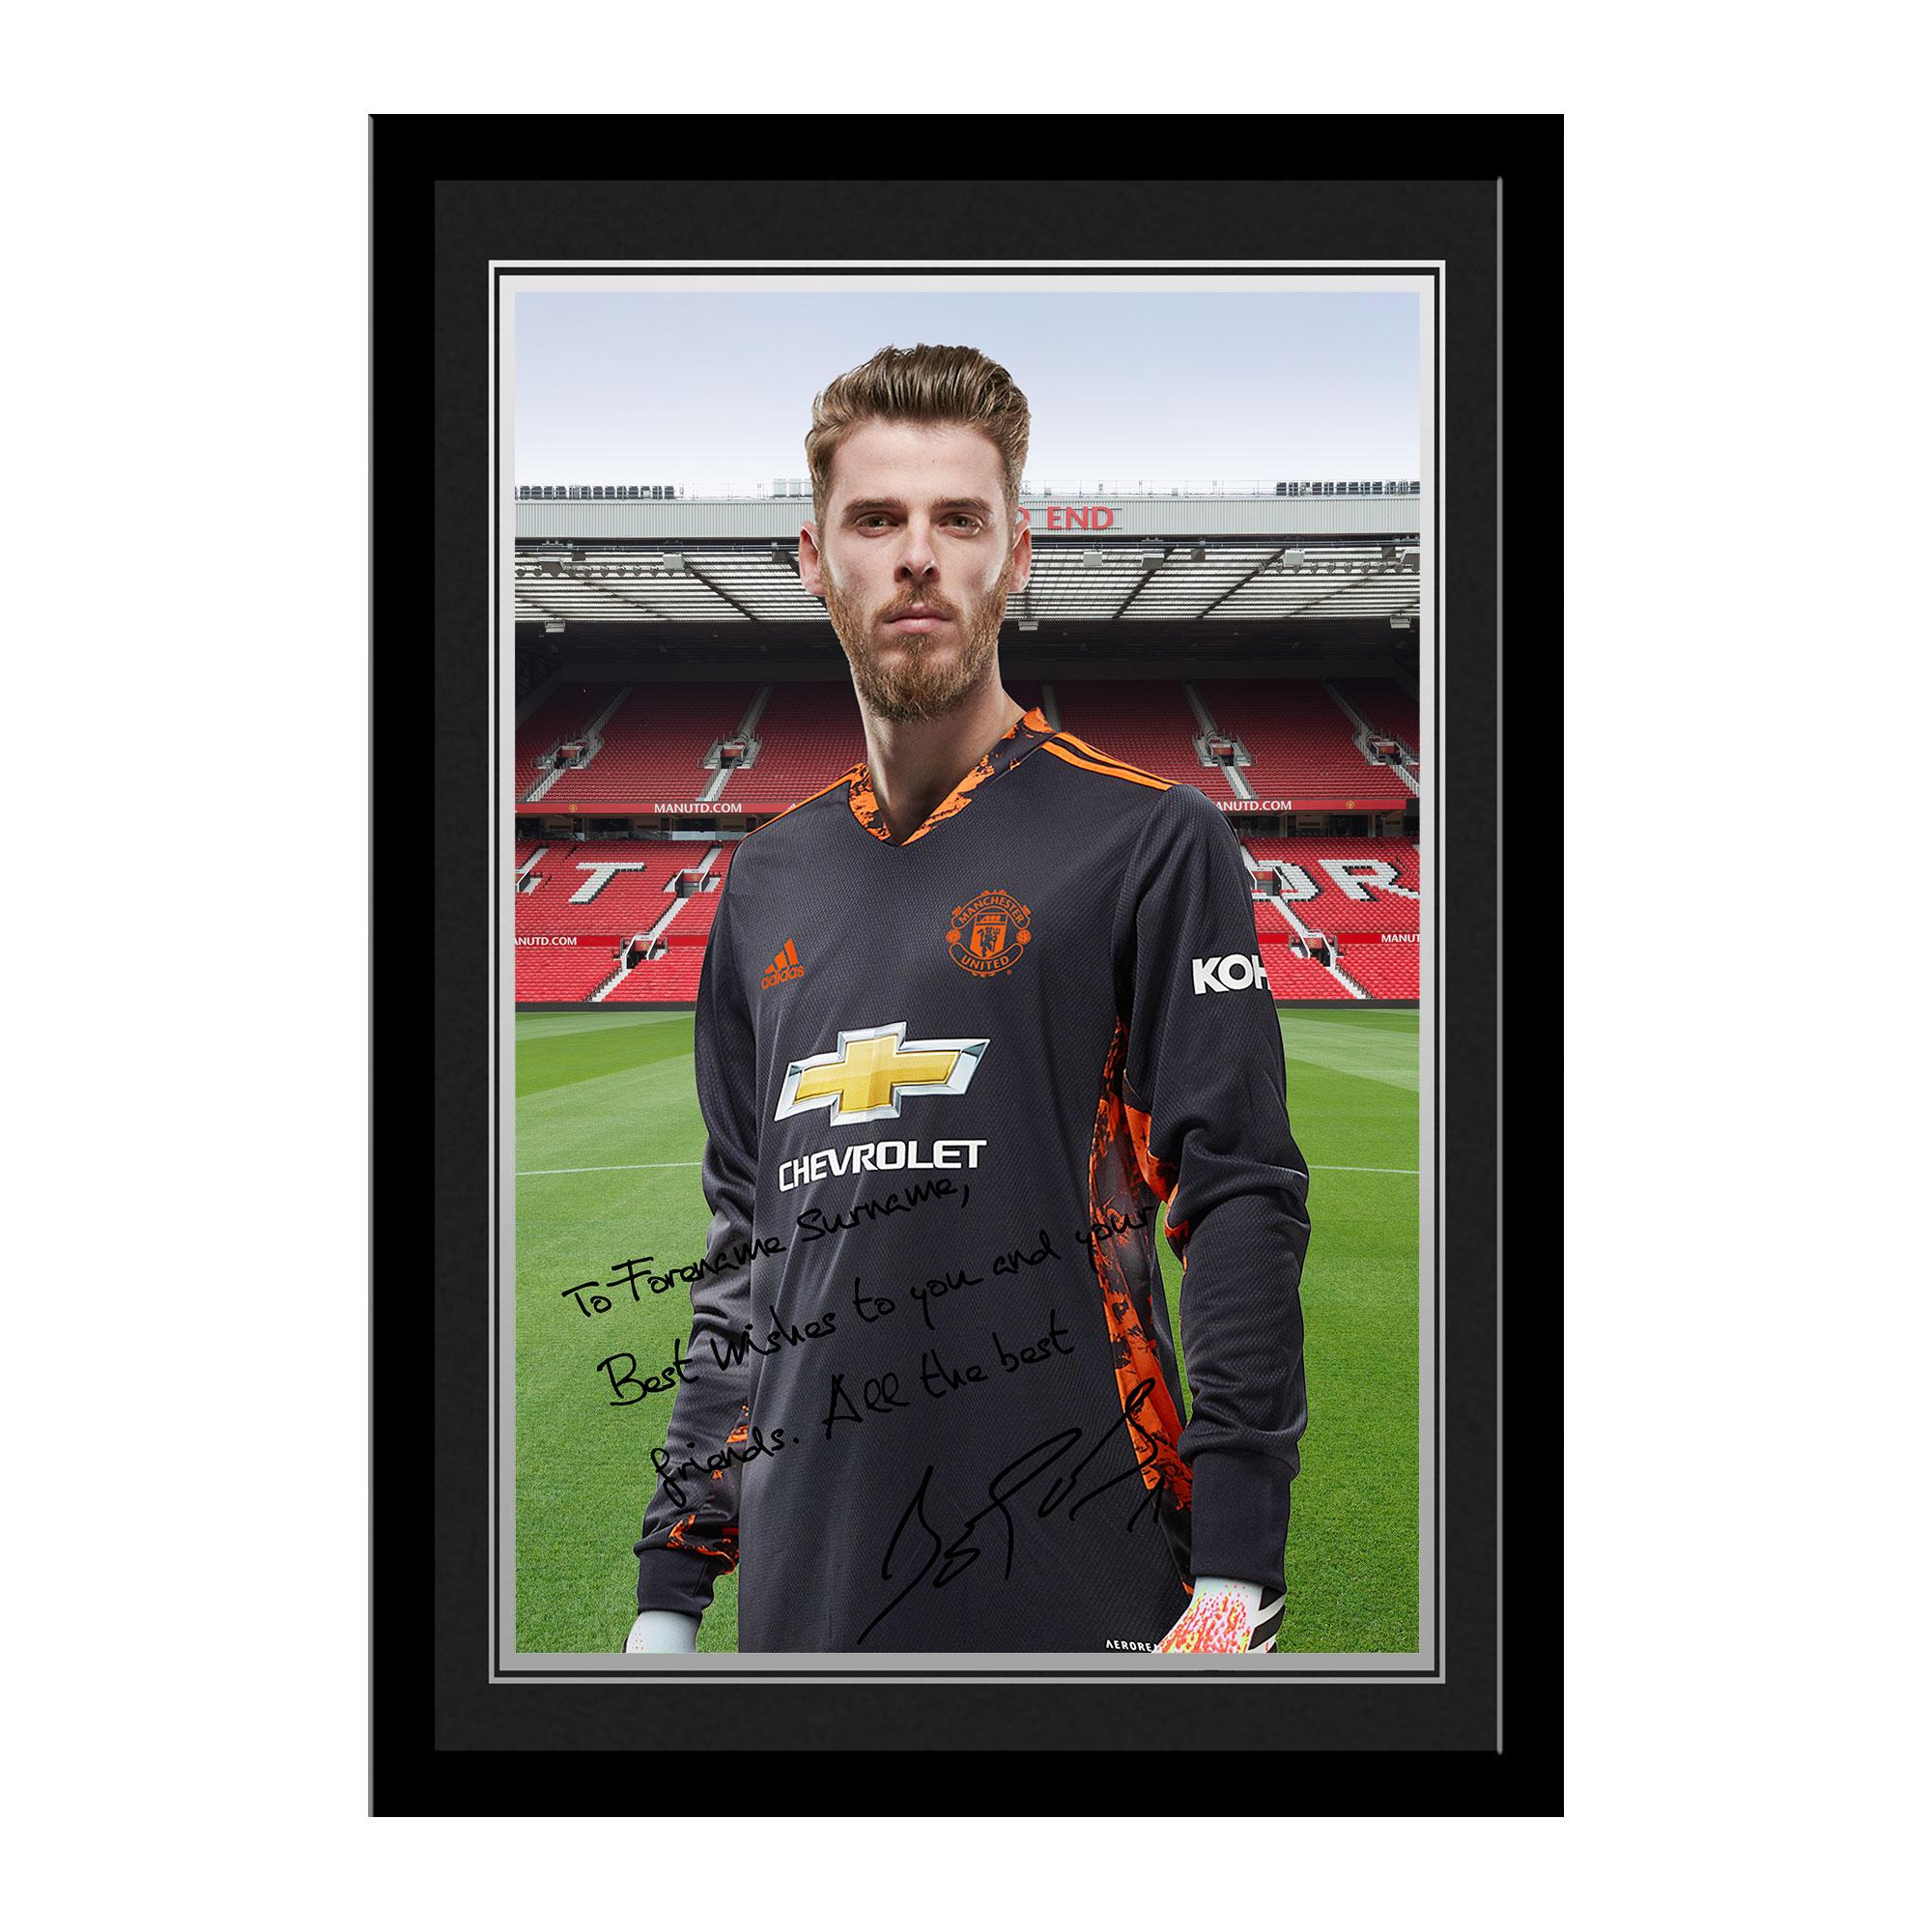 Manchester United FC De Gea Autograph Photo Framed